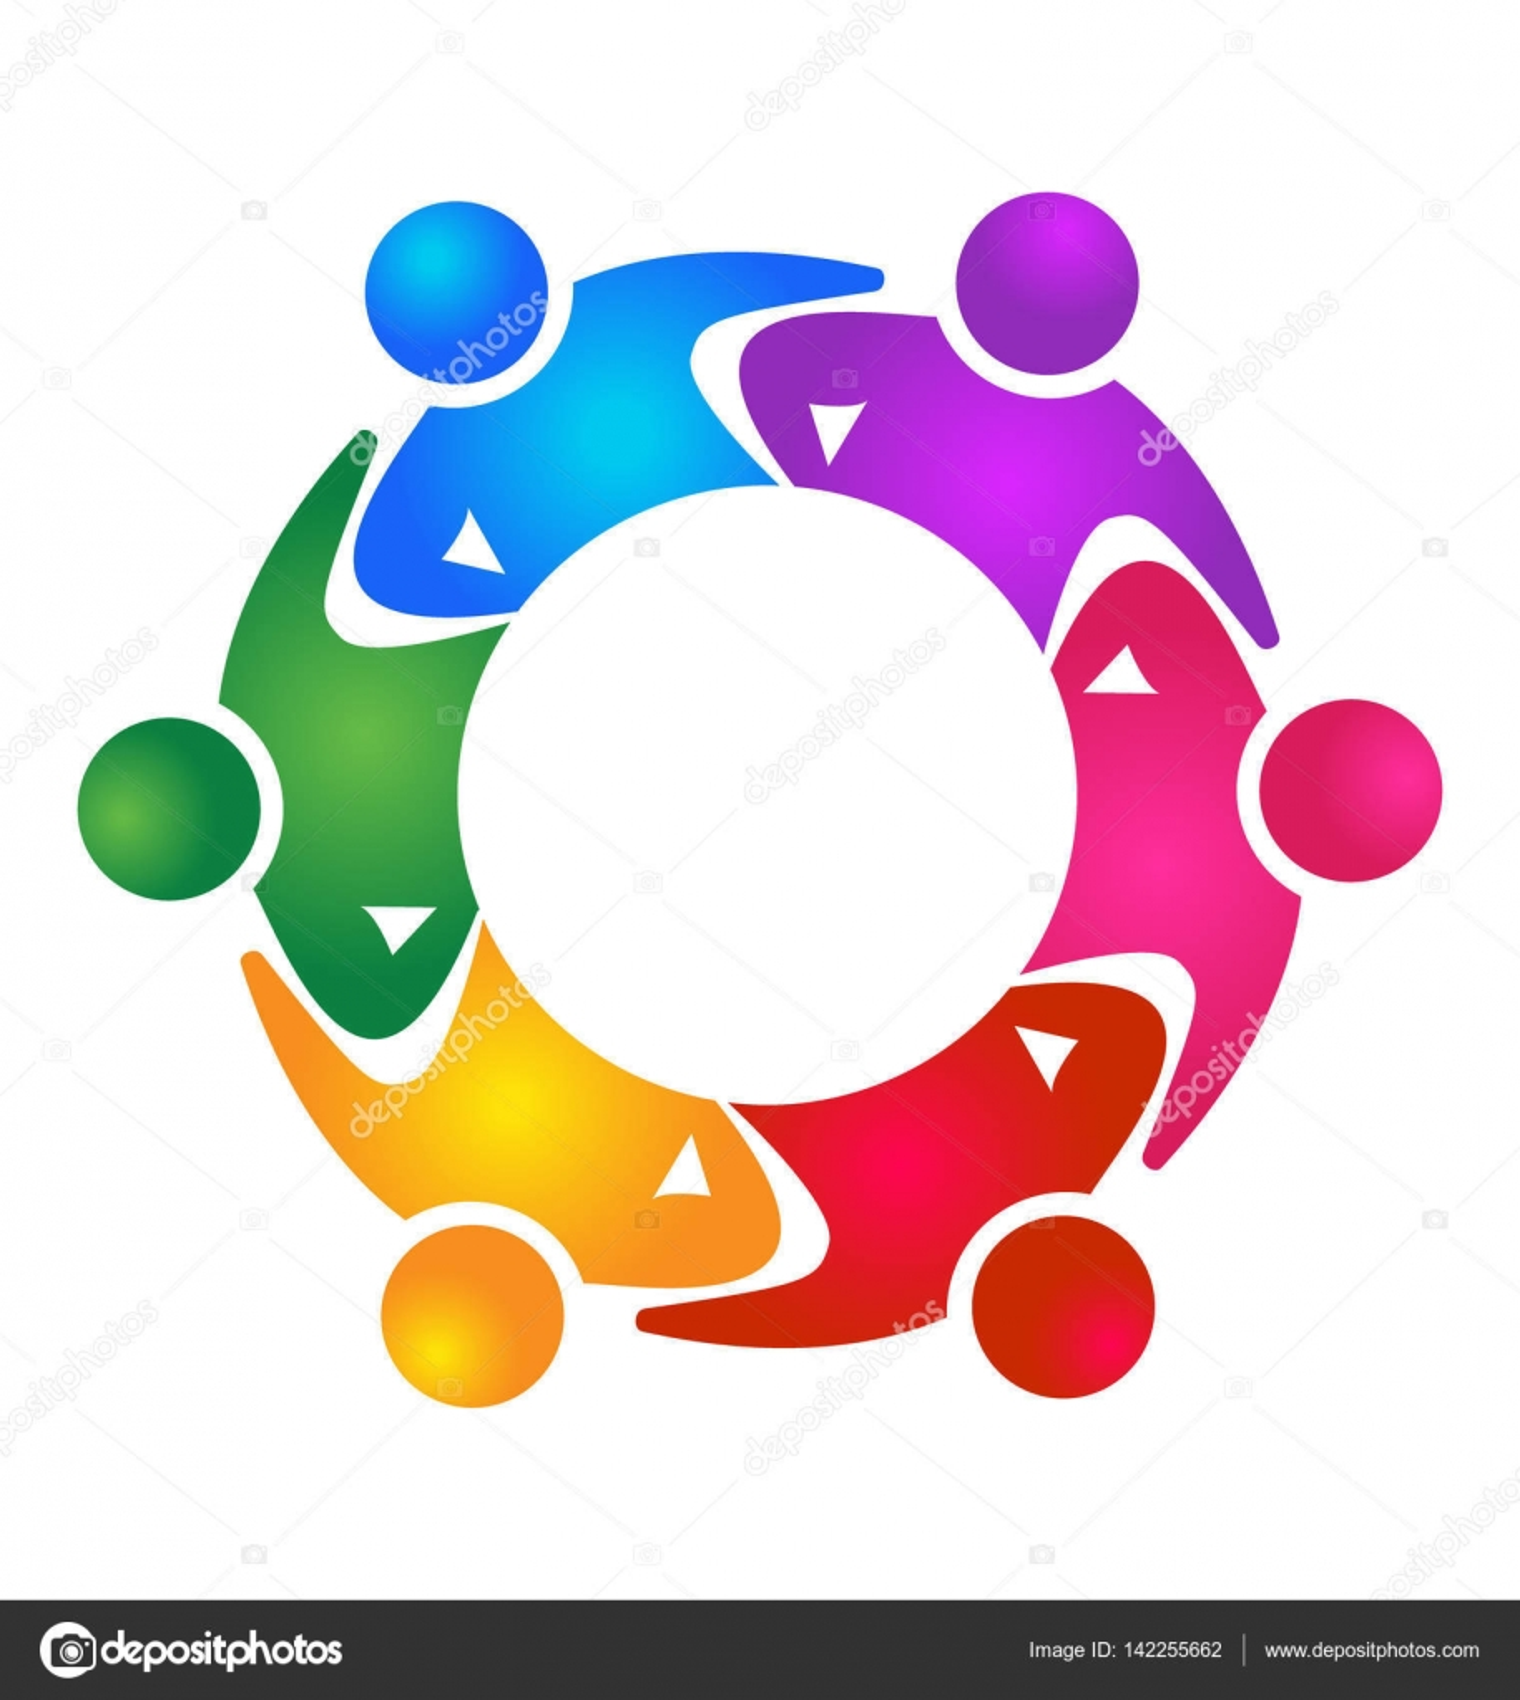 Teamwork unity people logo — Stock Vector © Glopphy #142255662